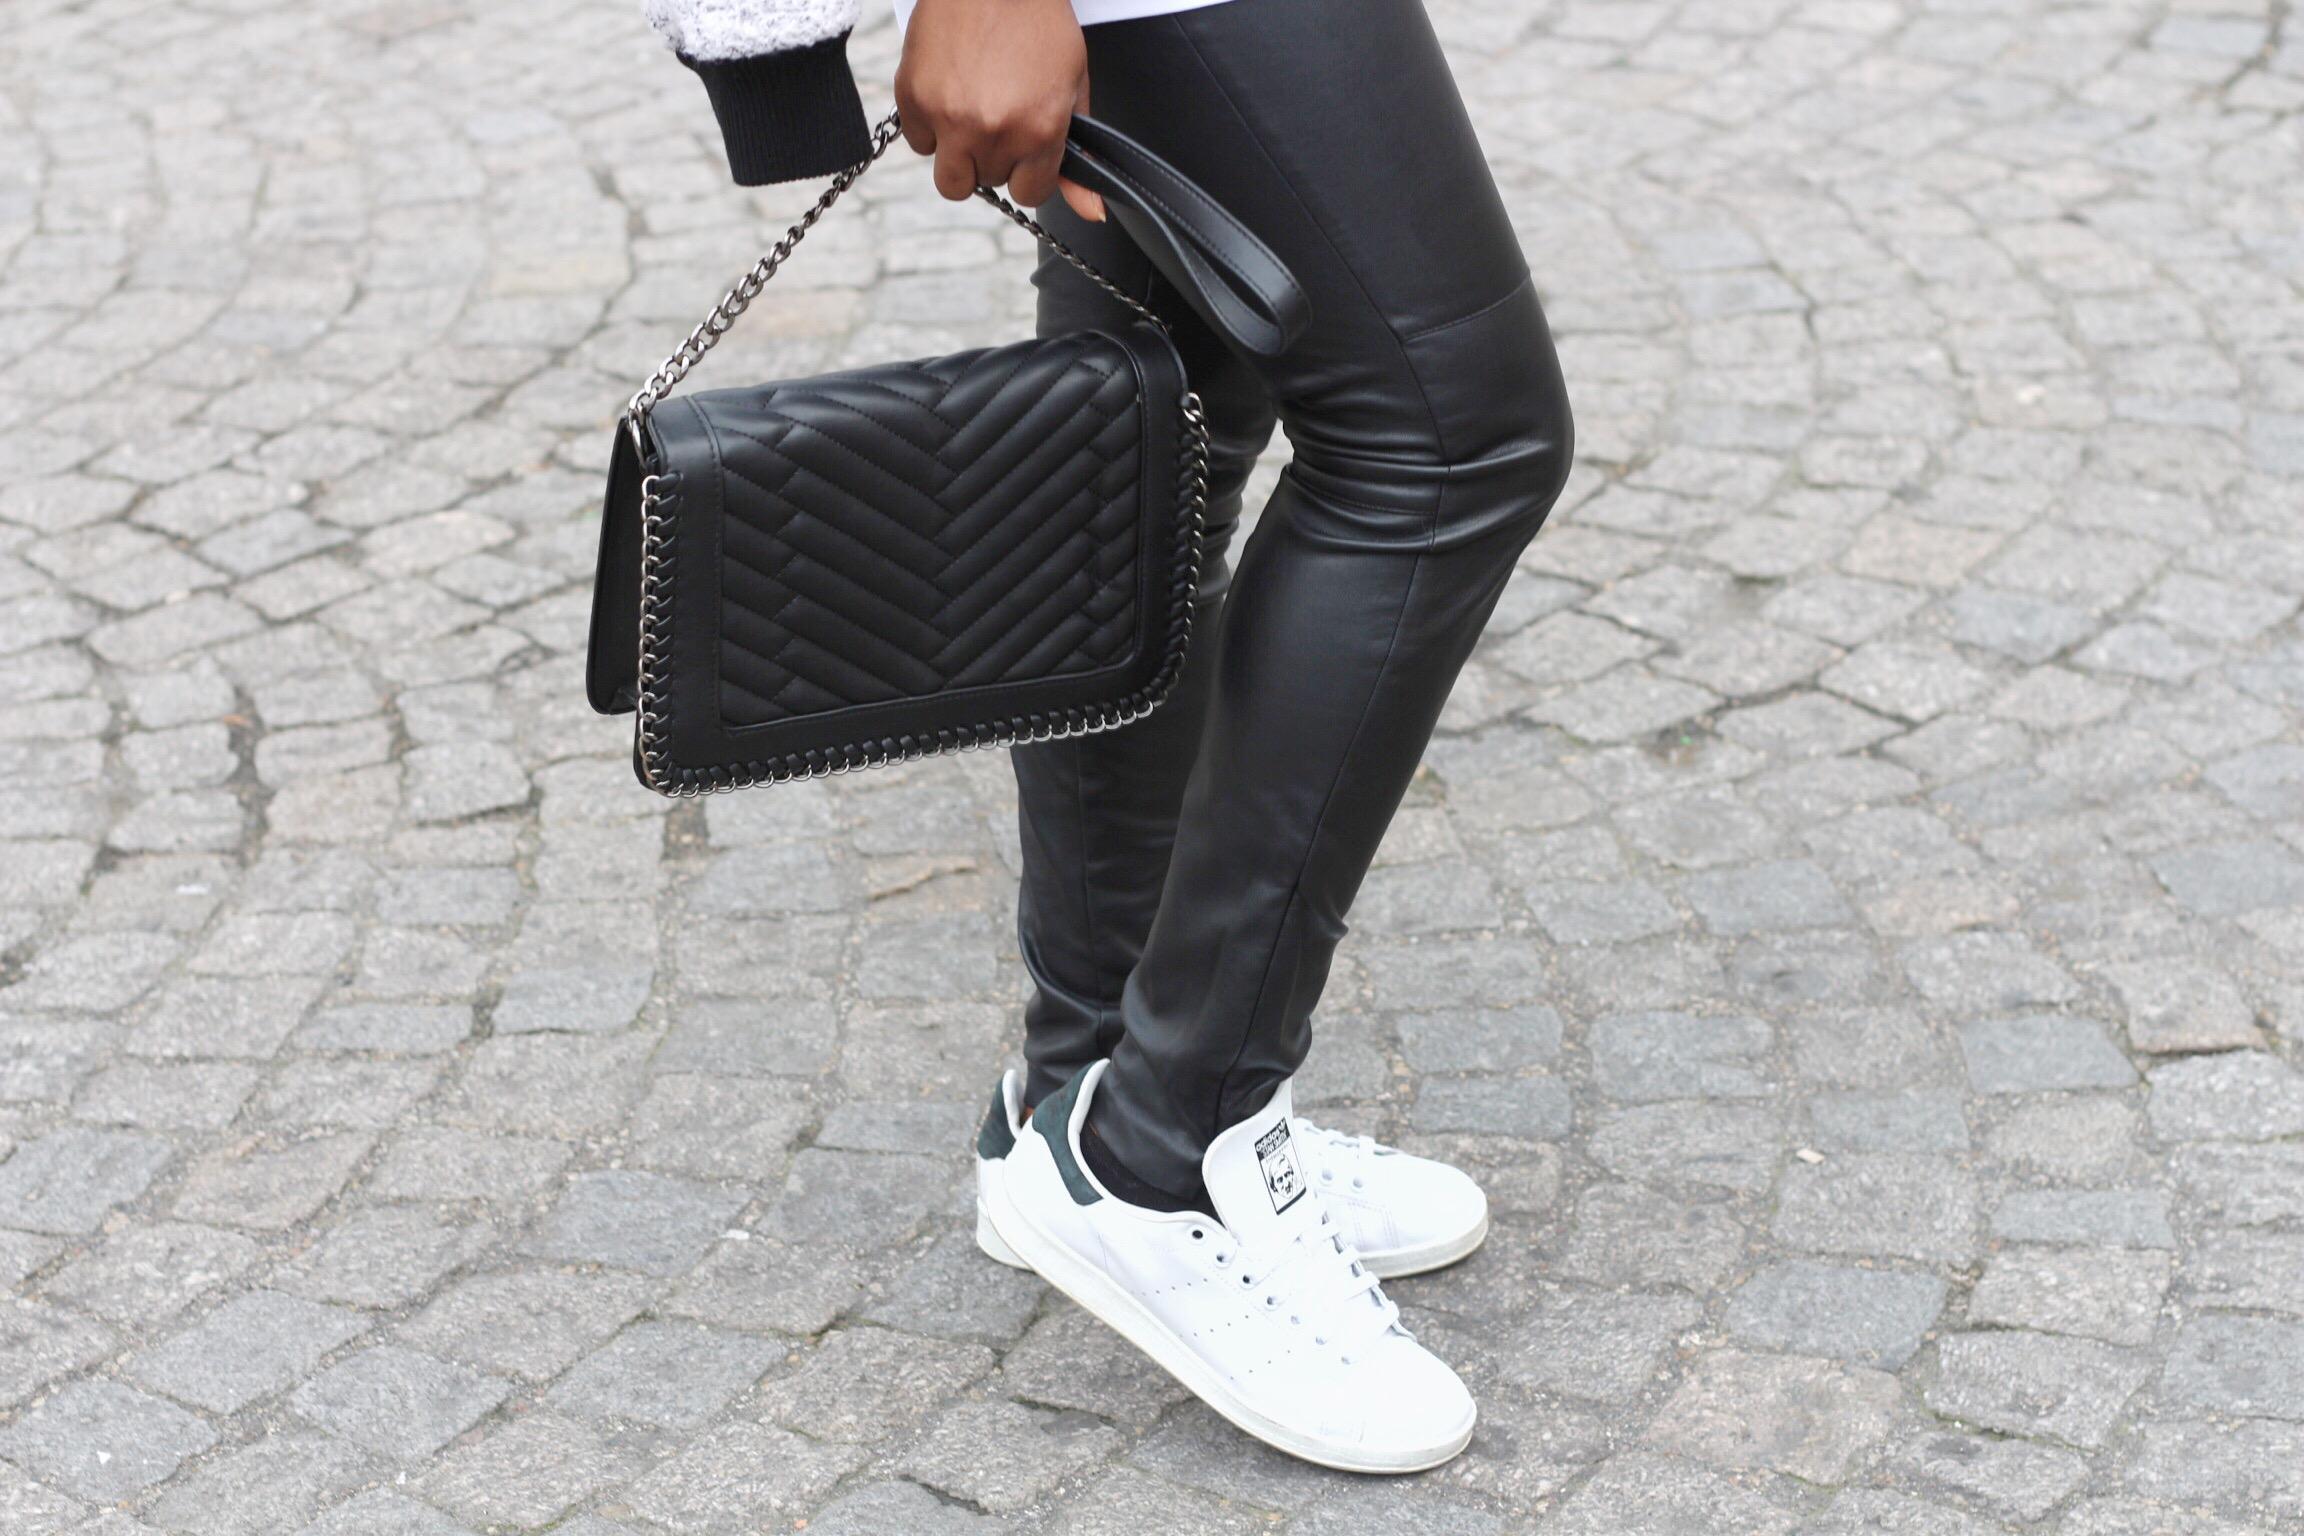 Trysha Gaba - Casual in Adidas 9